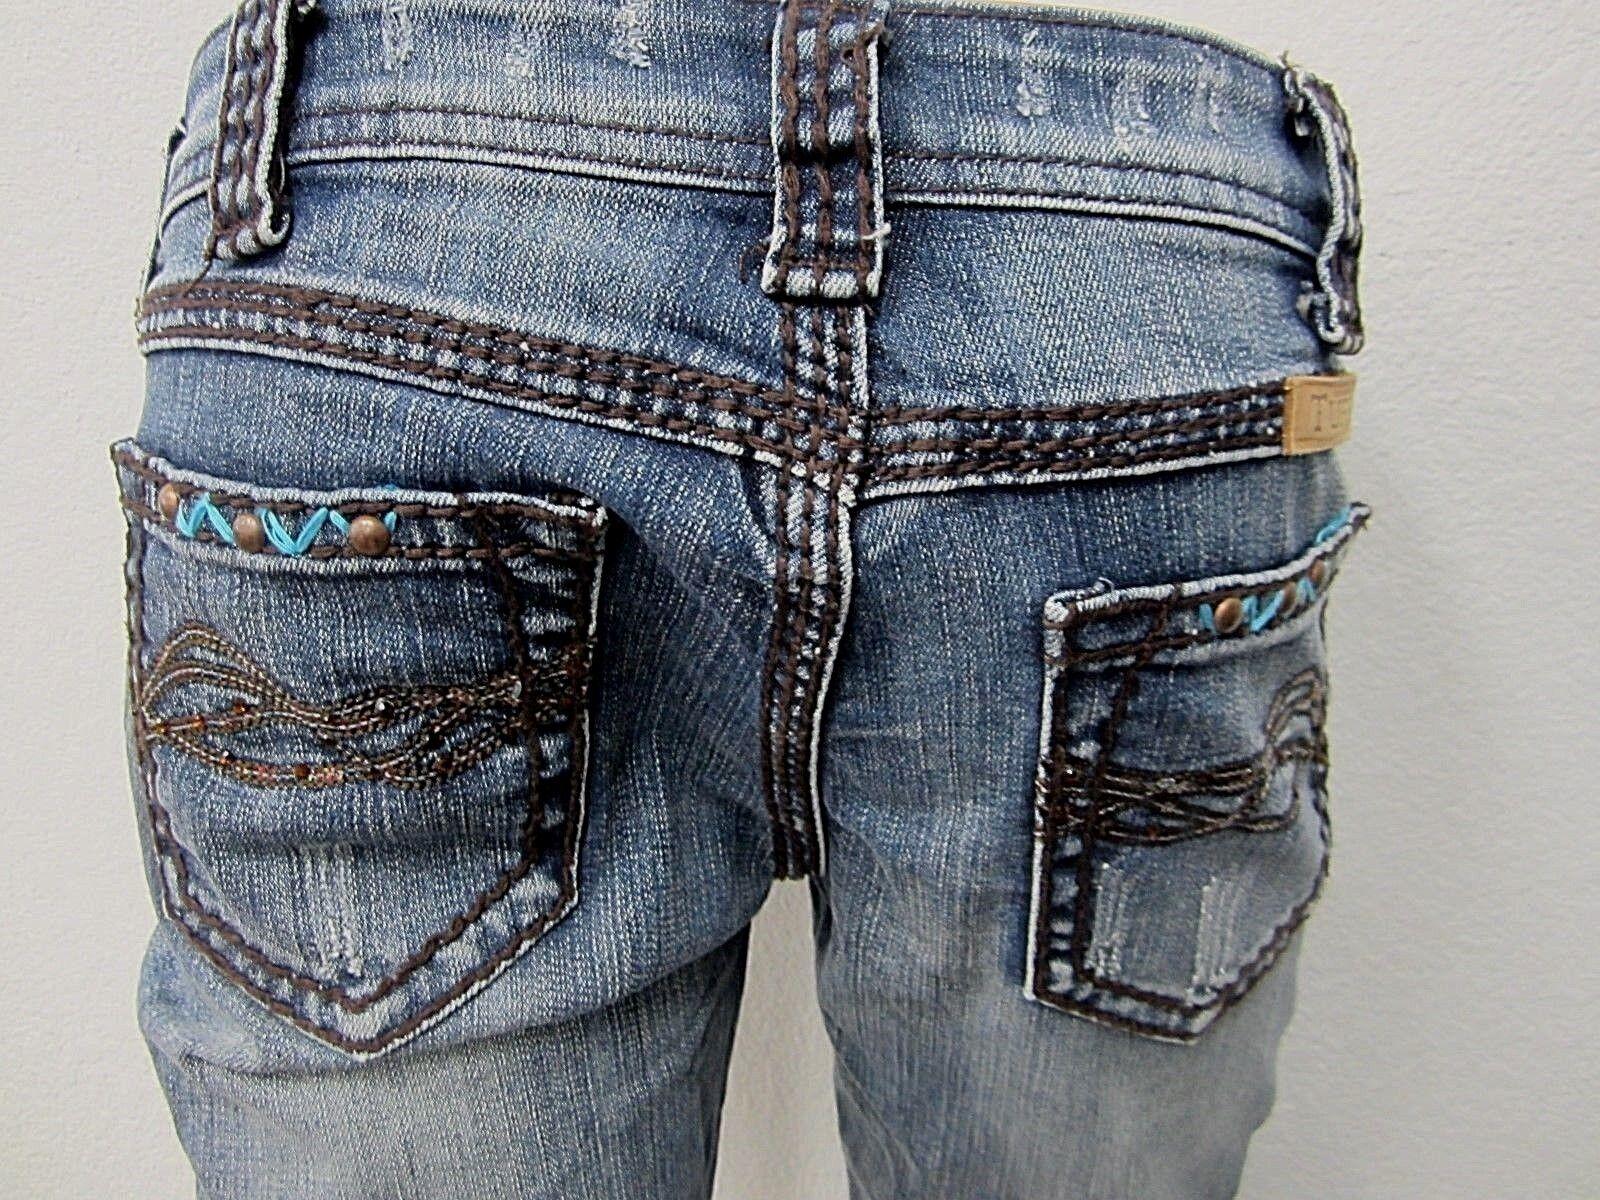 NWOT COWGIRLTUFF Copper Bling Jeans Womens Capri Distressed Stretch Sz 26 x 24